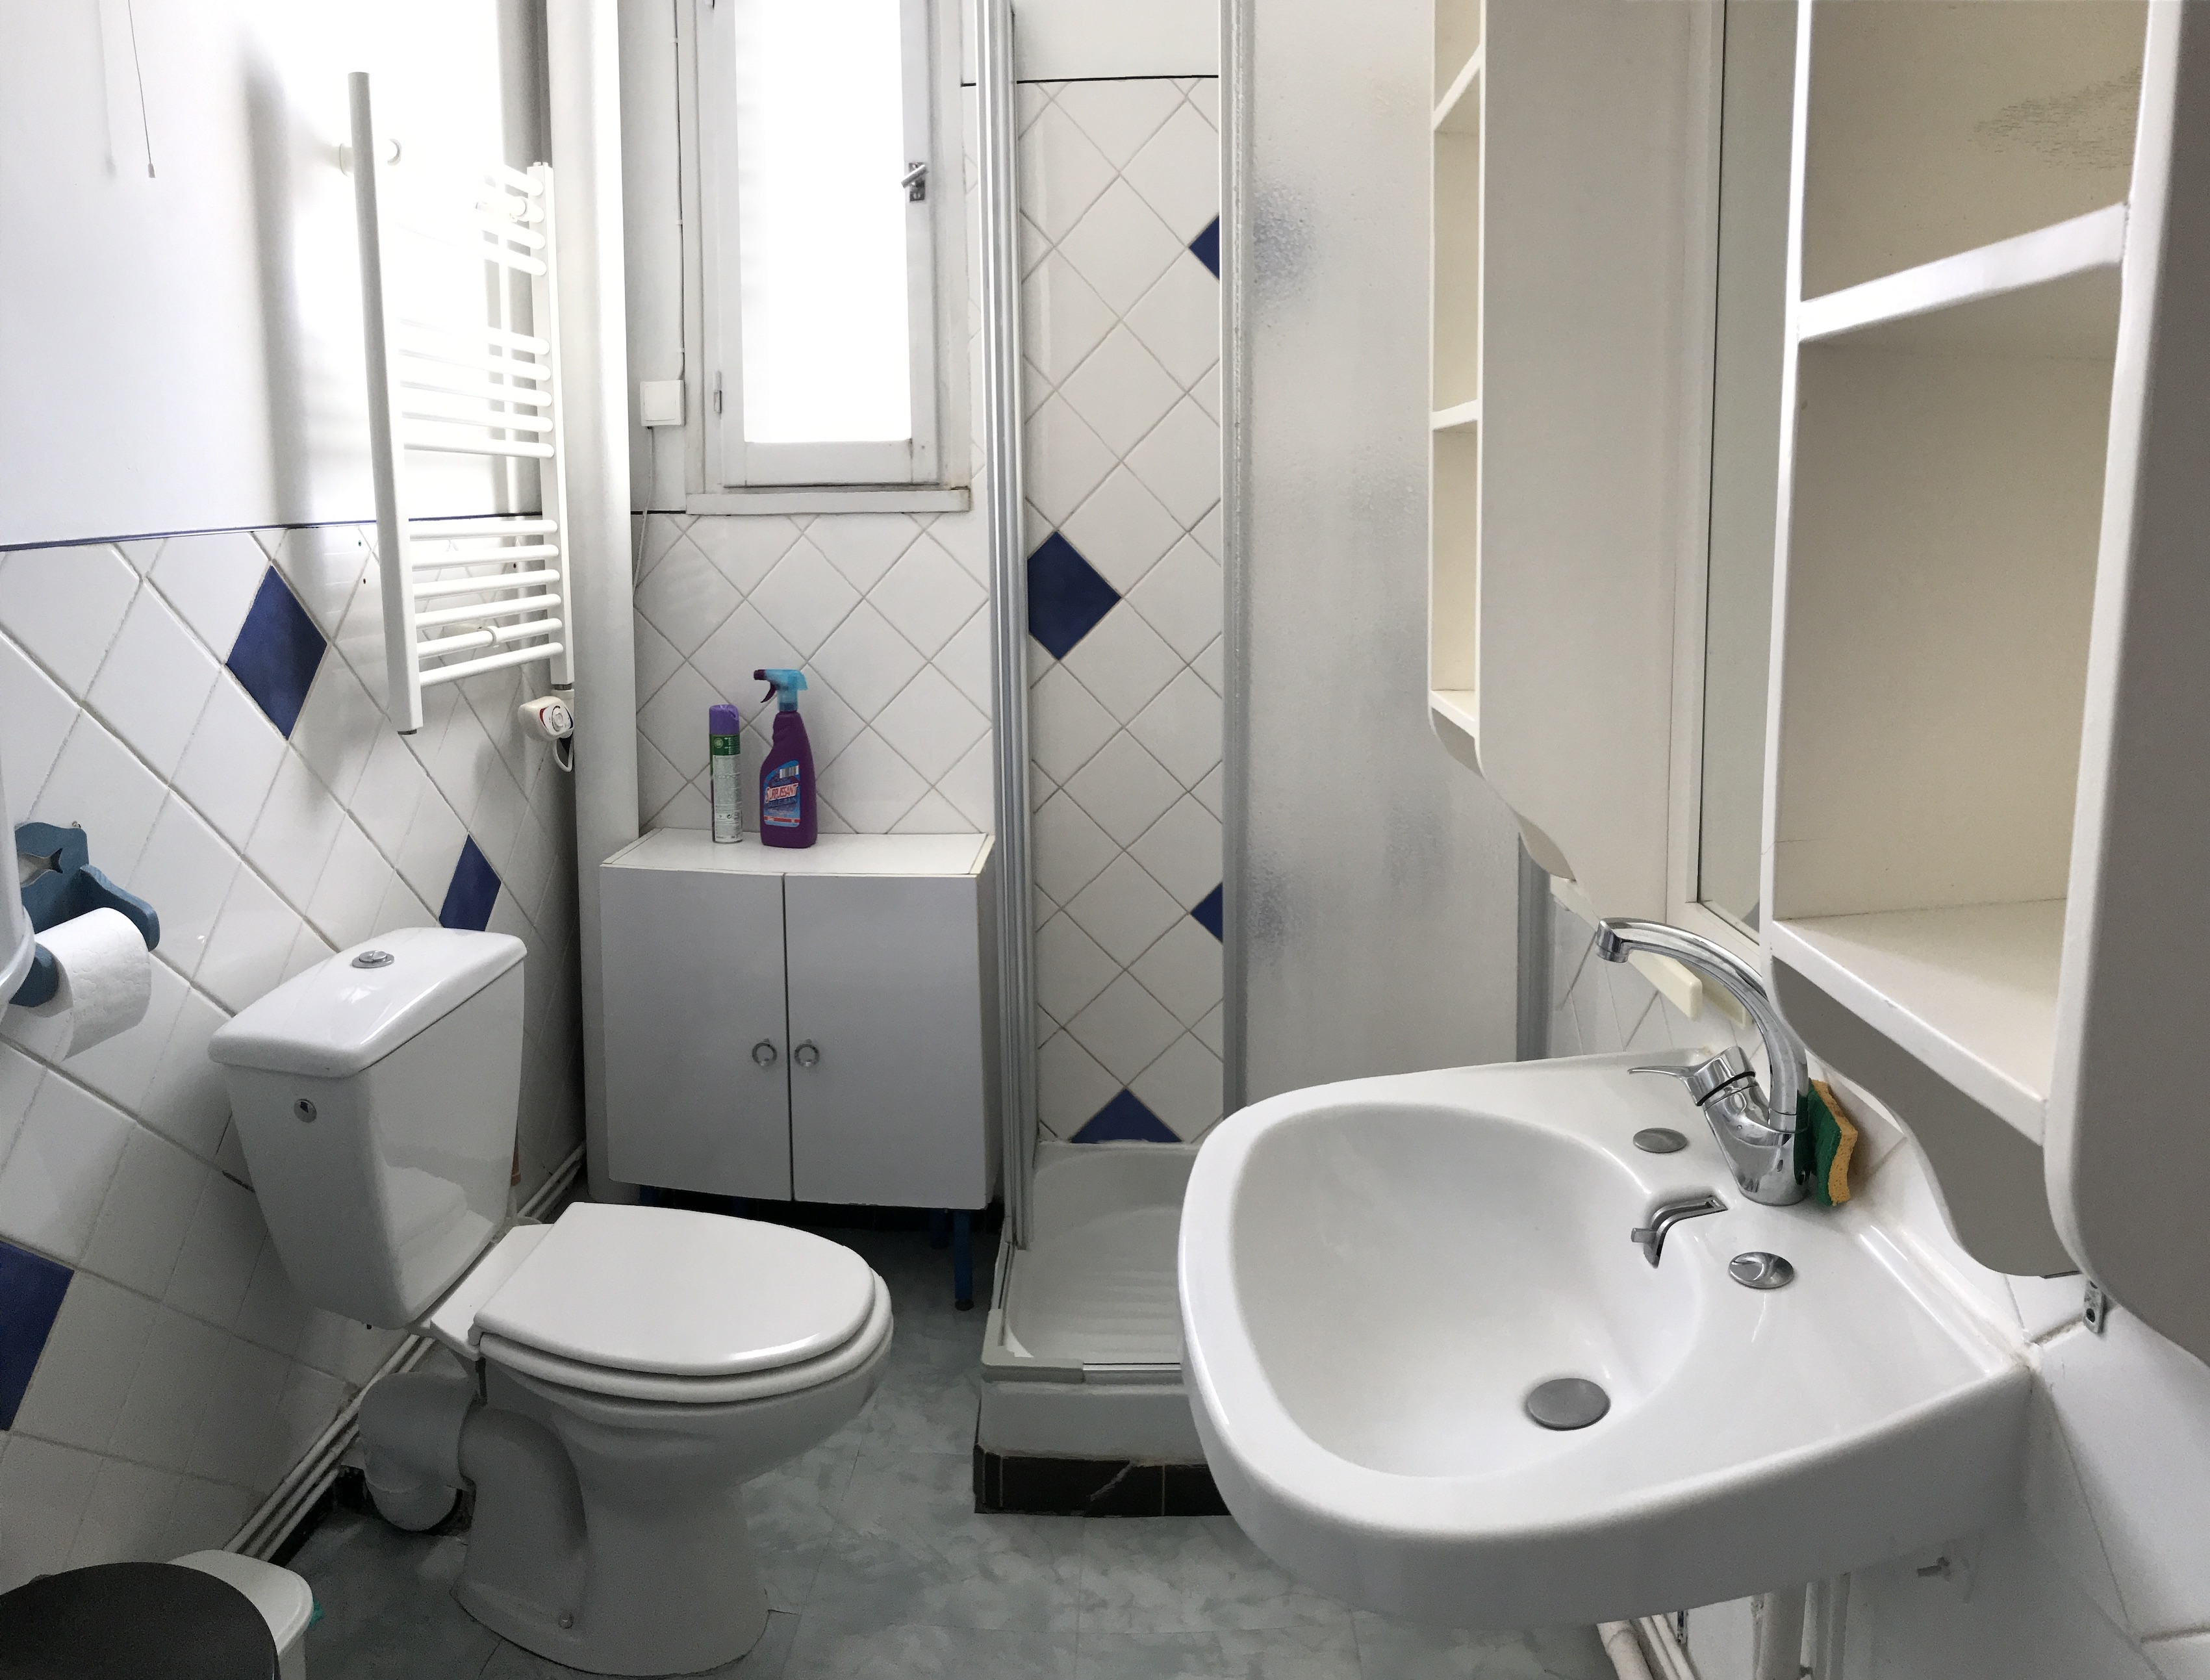 ferraud sdb - ANCELLE GRAND T2 DE 50 m2 (6 couchages)